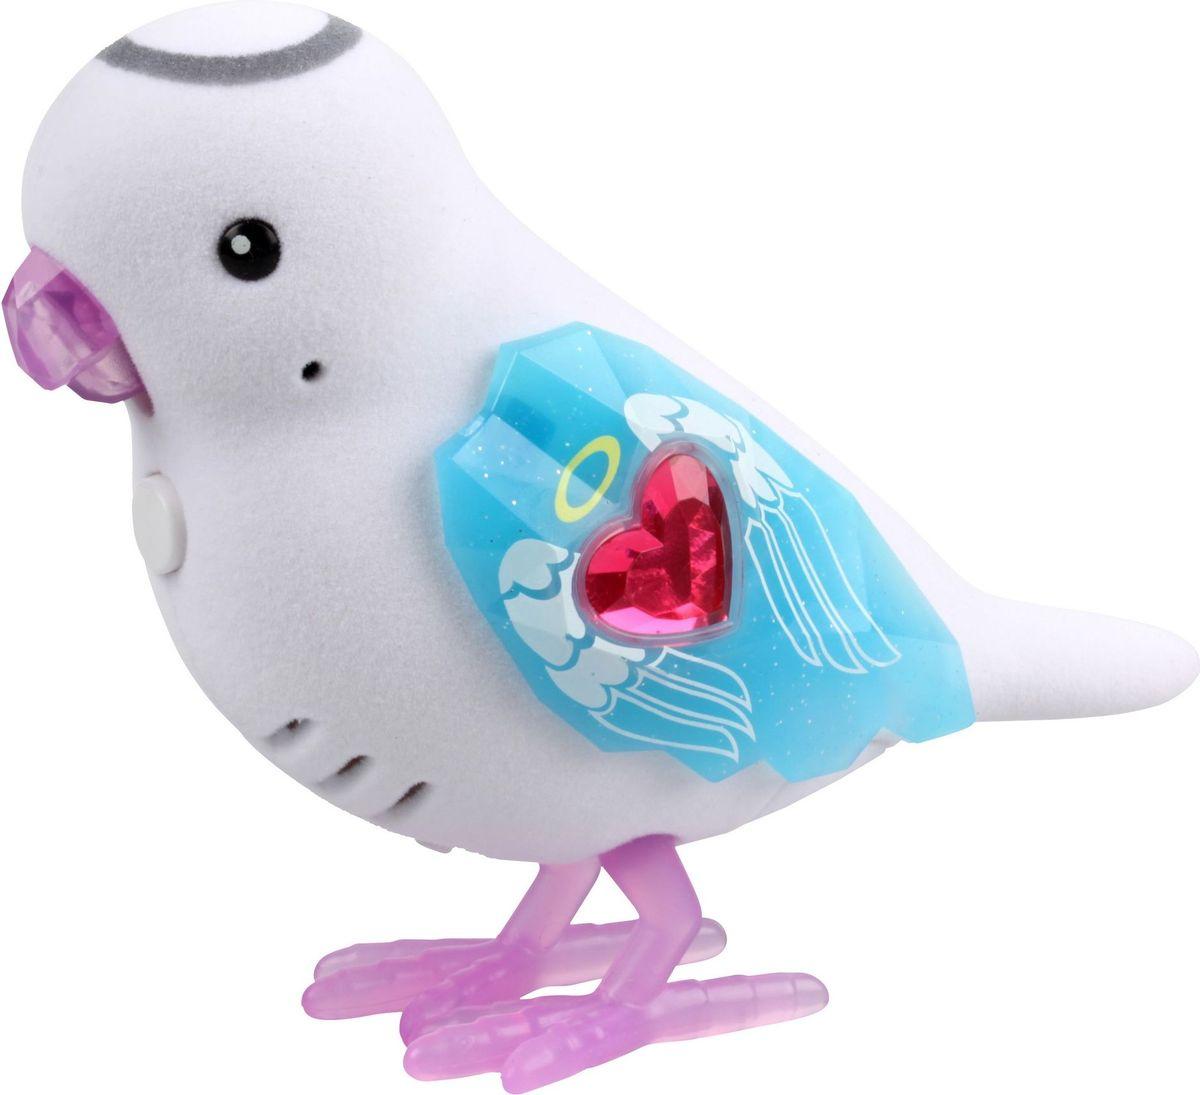 Little Live Pets Интерактивная игрушка Птичка Angel Alice - Интерактивные игрушки